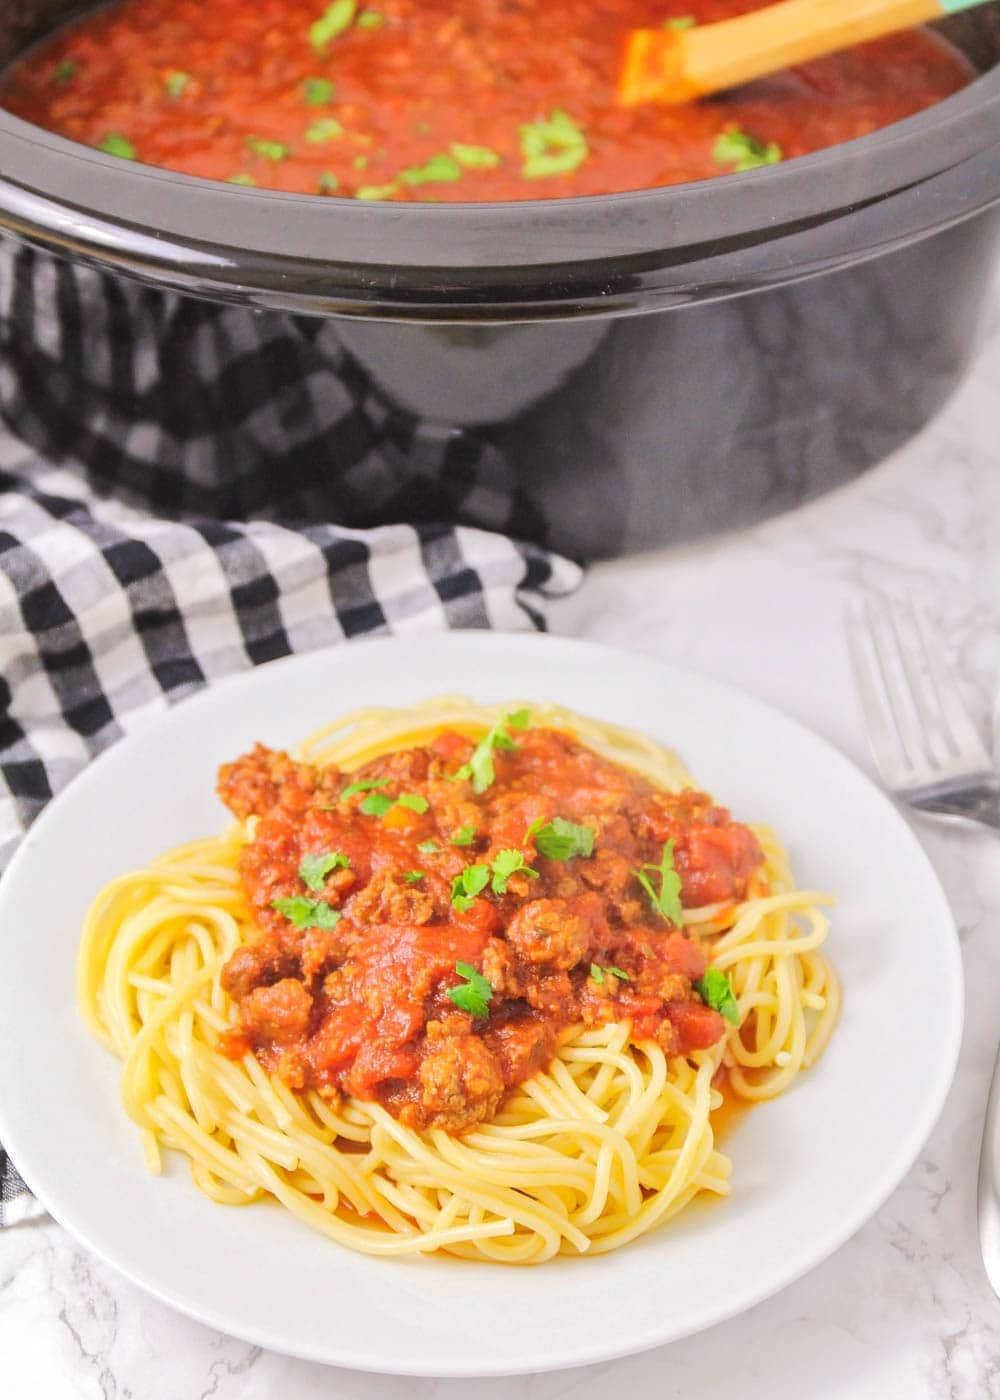 Crock Pot Spaghetti Recipe on a white plate